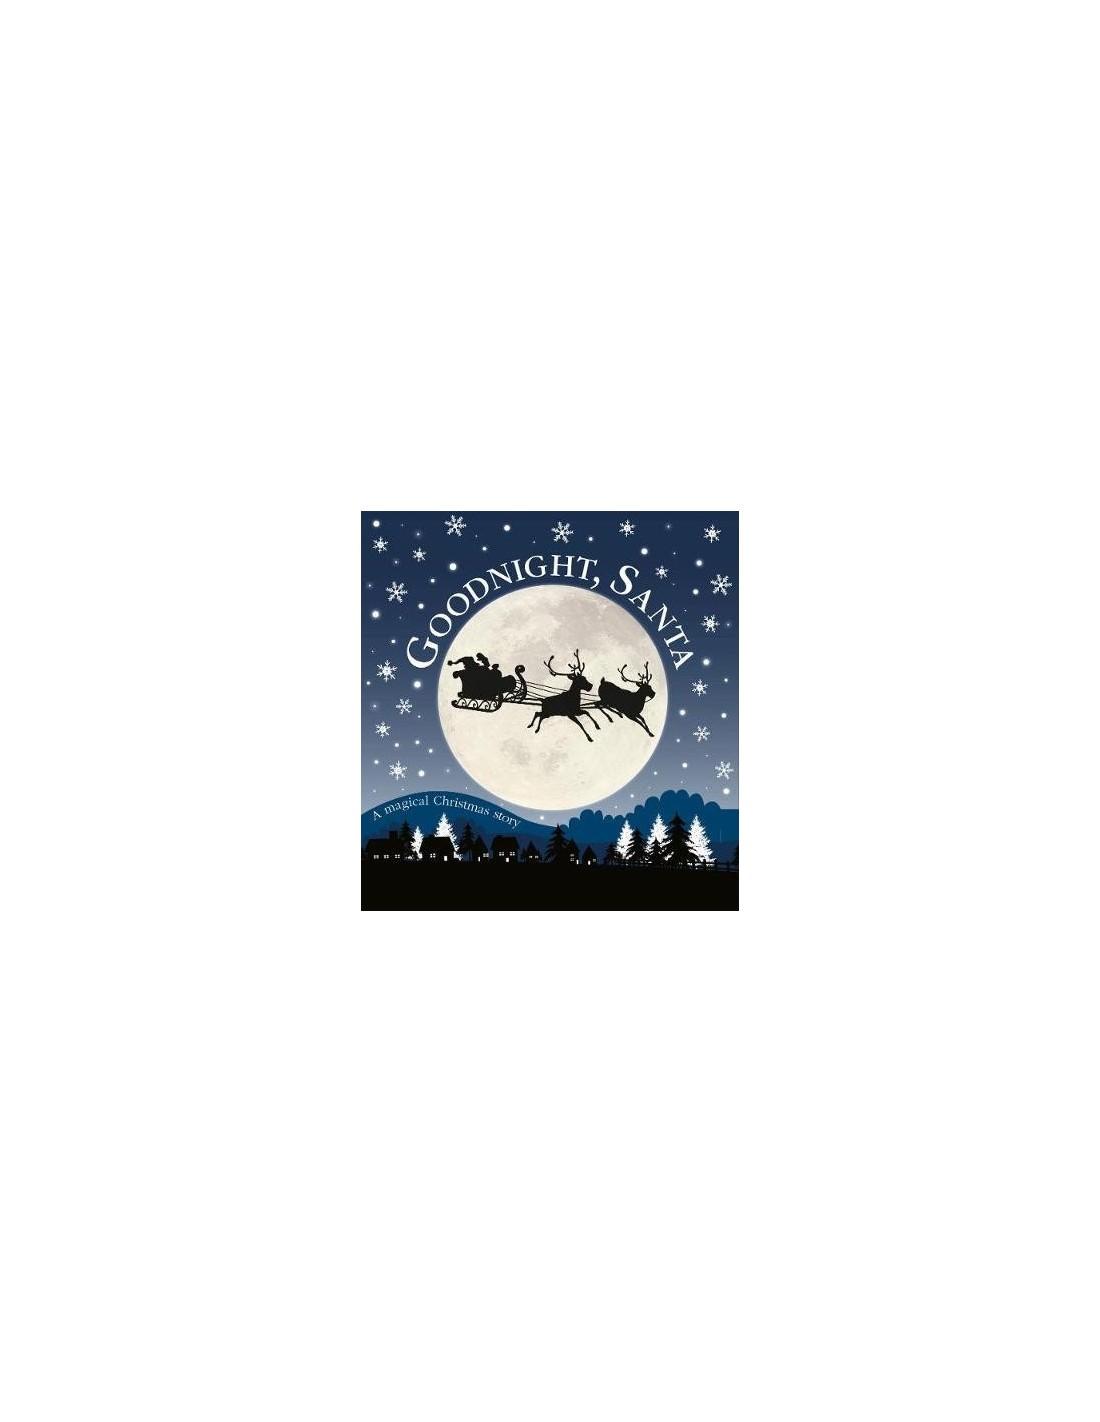 Goodnight, Santa : A Magical Christmas Story 9780241376478 - Pret r...